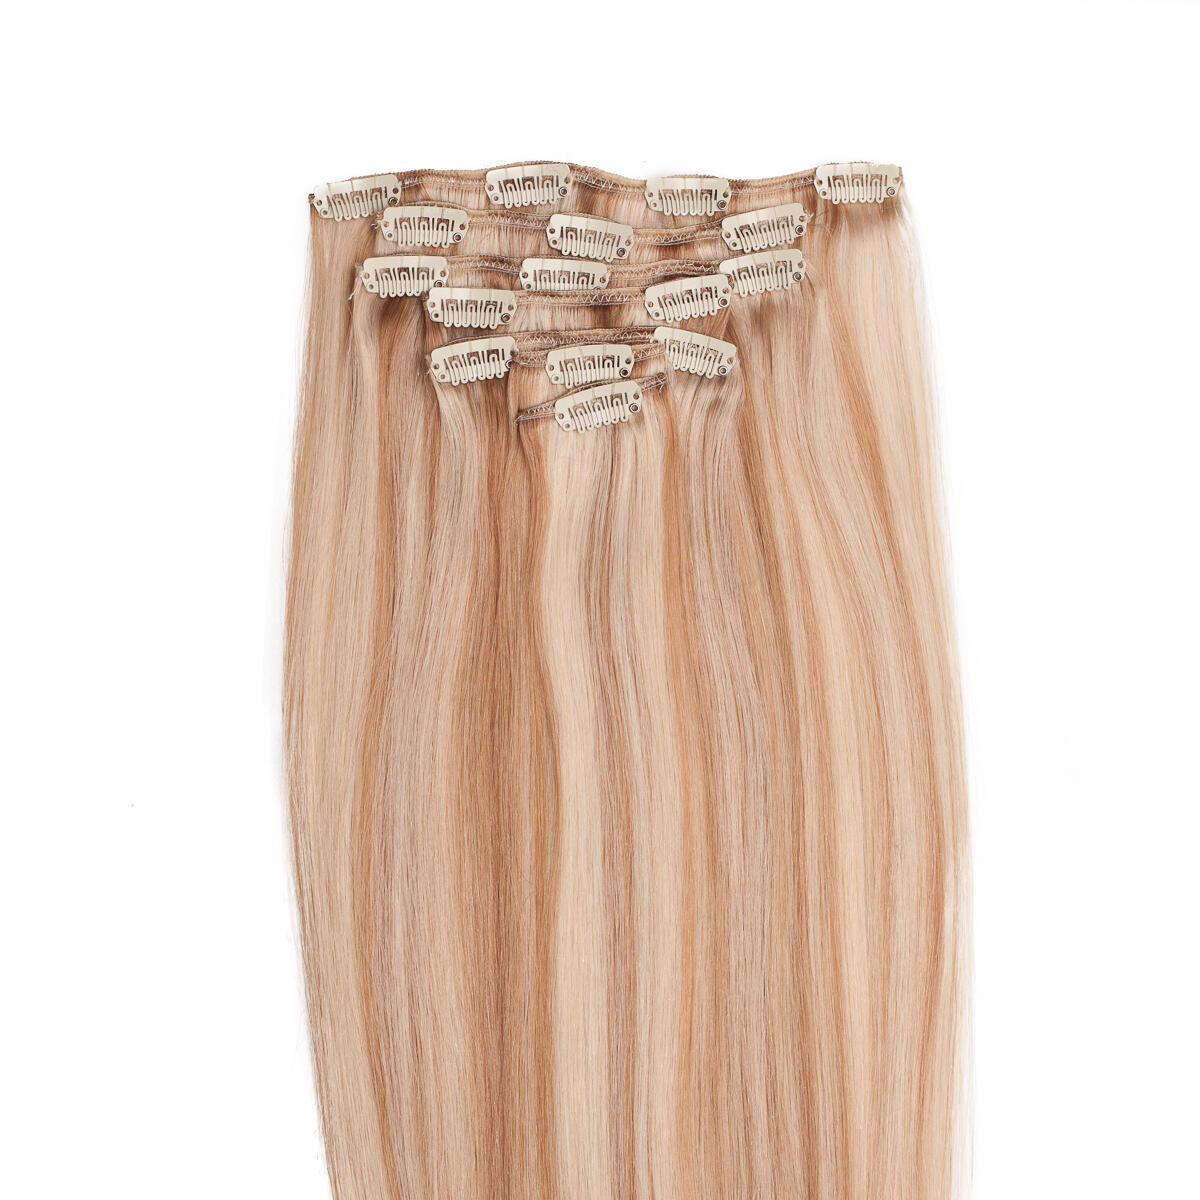 Clip-on set M22 Chad Wood Blond Mix 50 cm